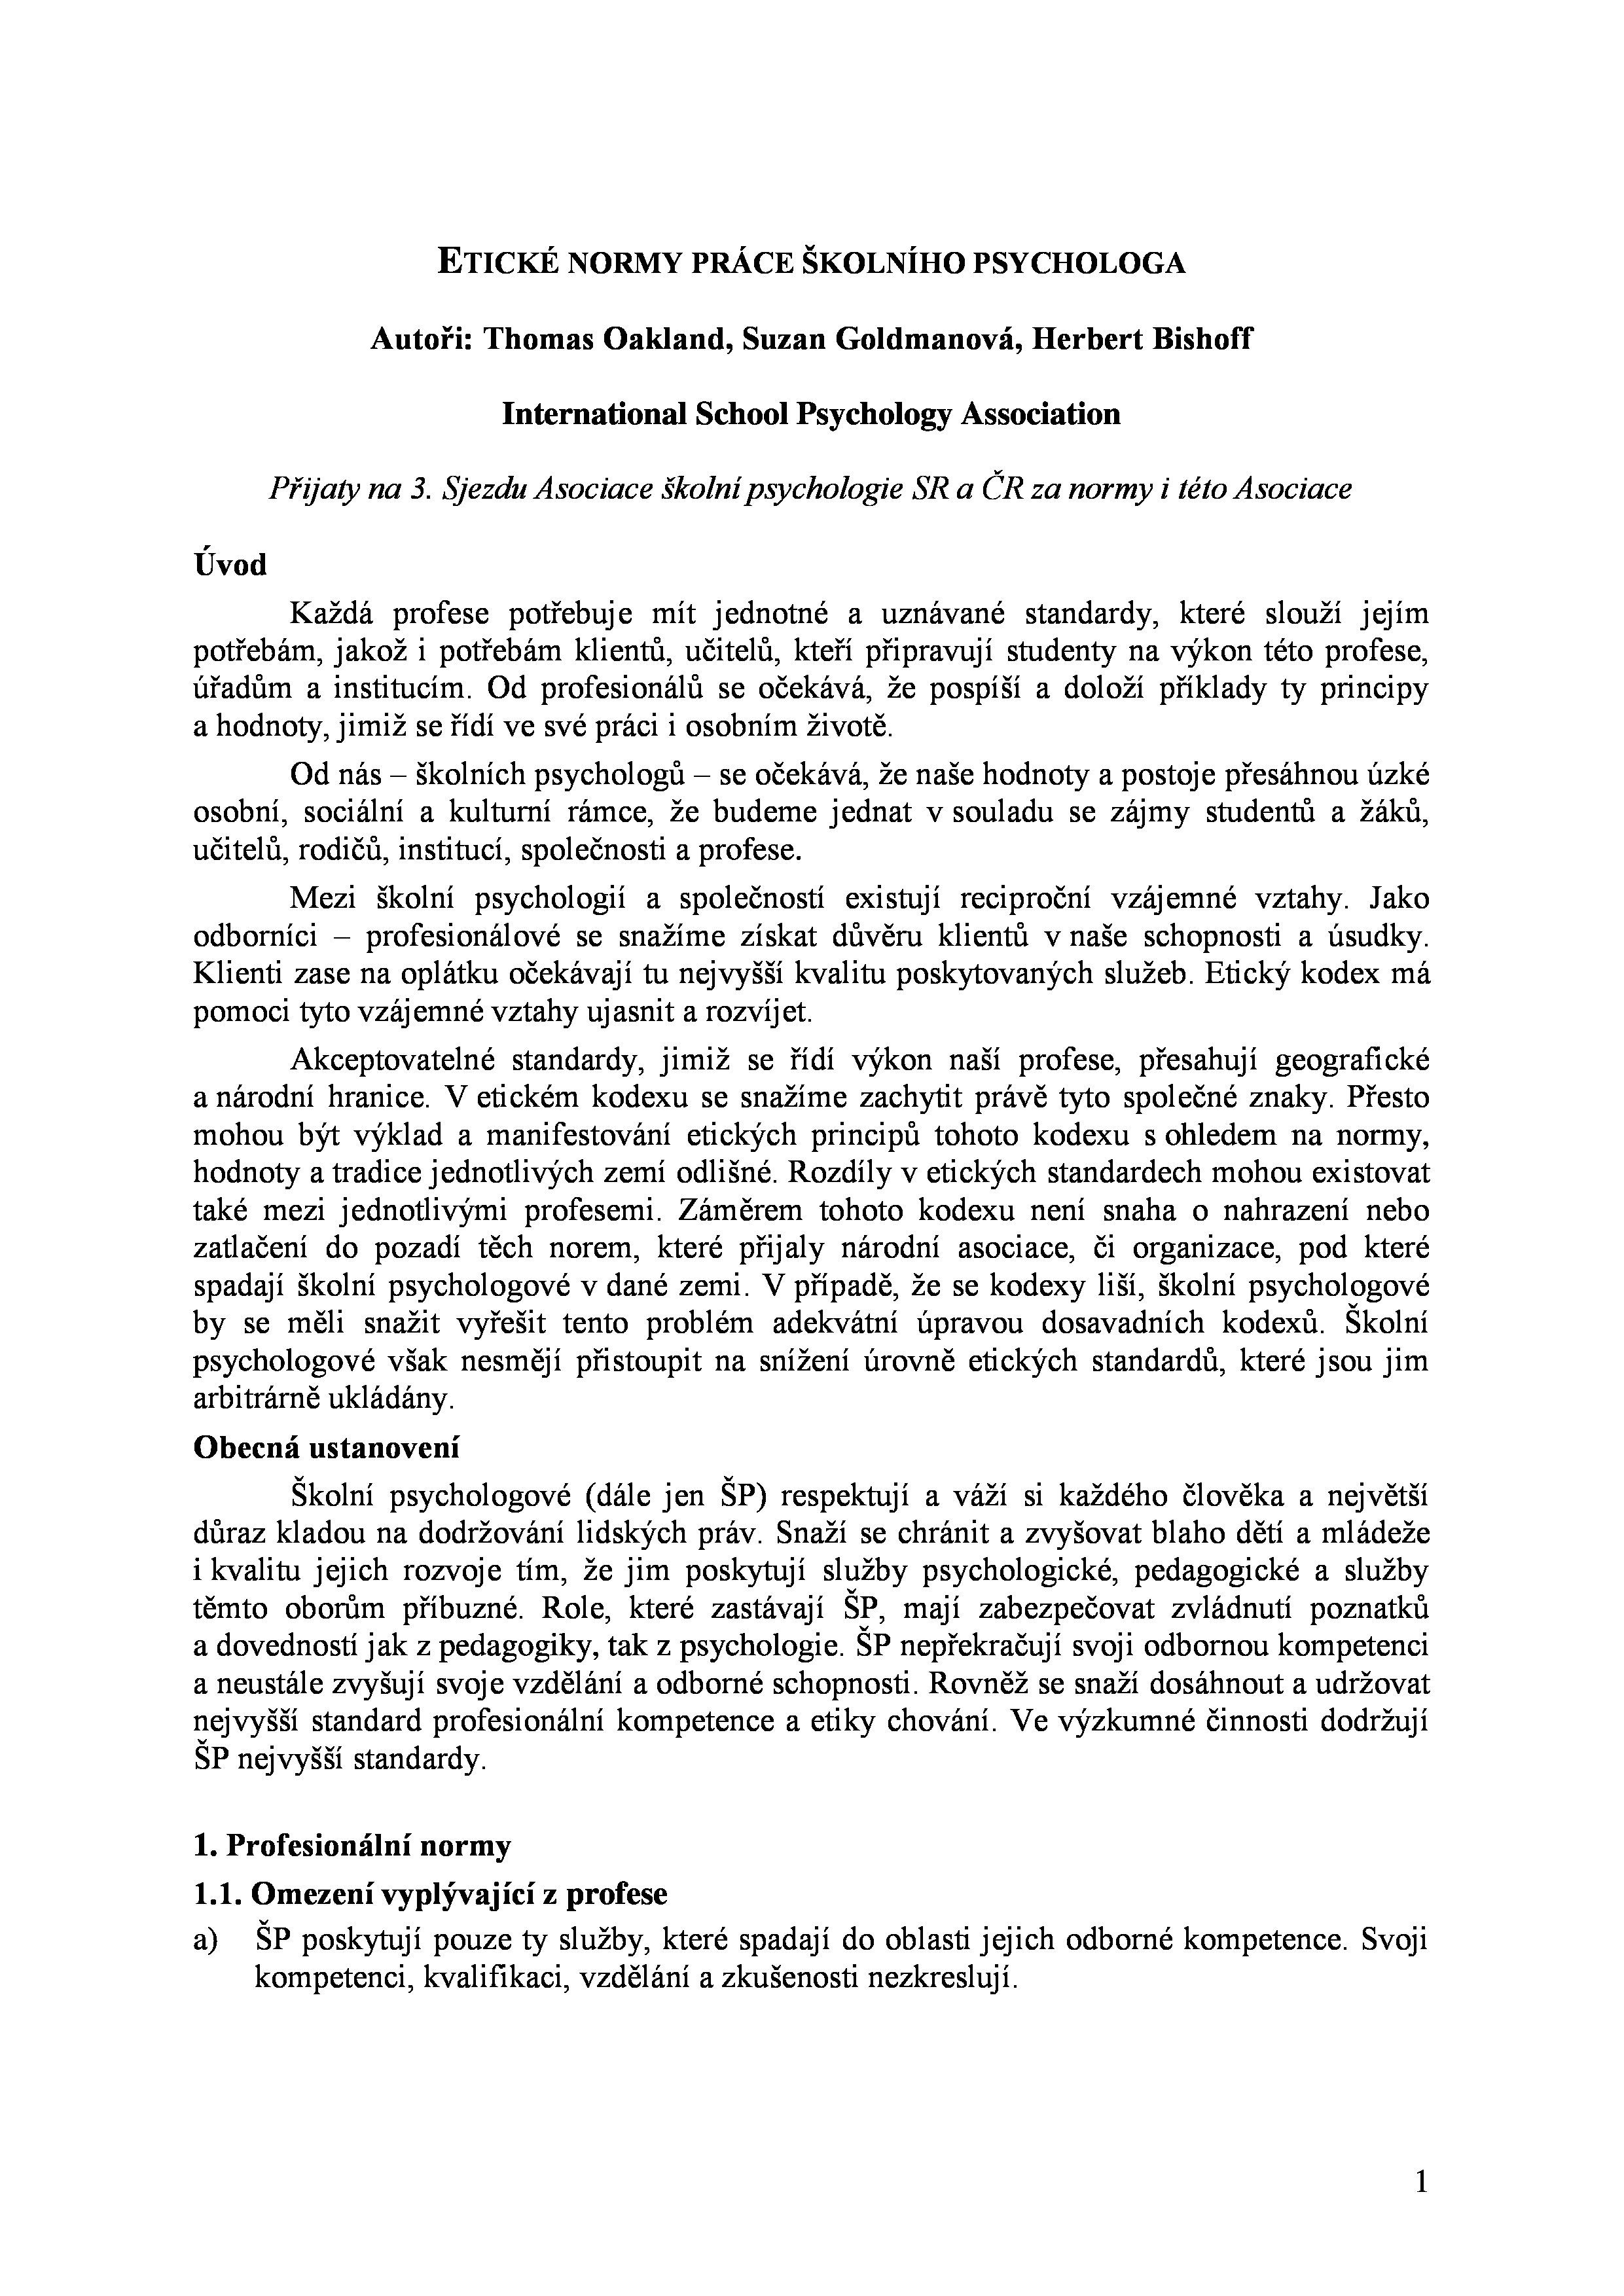 eticke_normy_prace_skolniho_psychologa-page-0